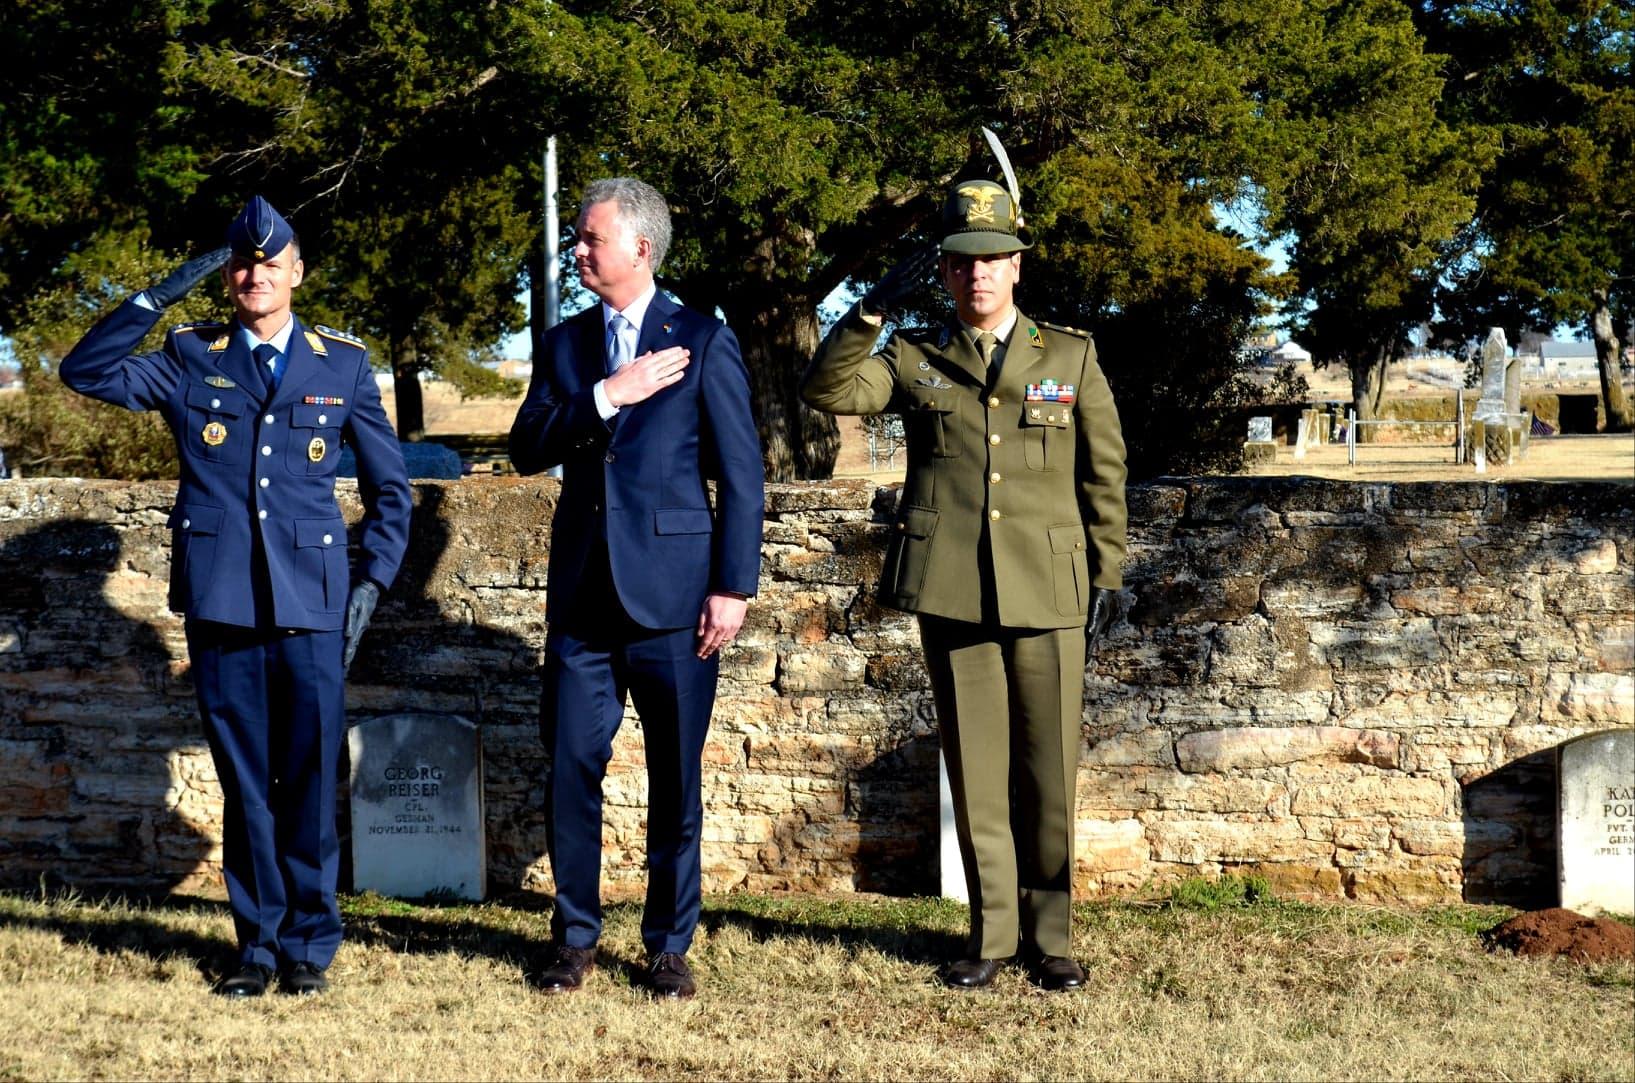 POW Cemetery Fort Reno Uniforms